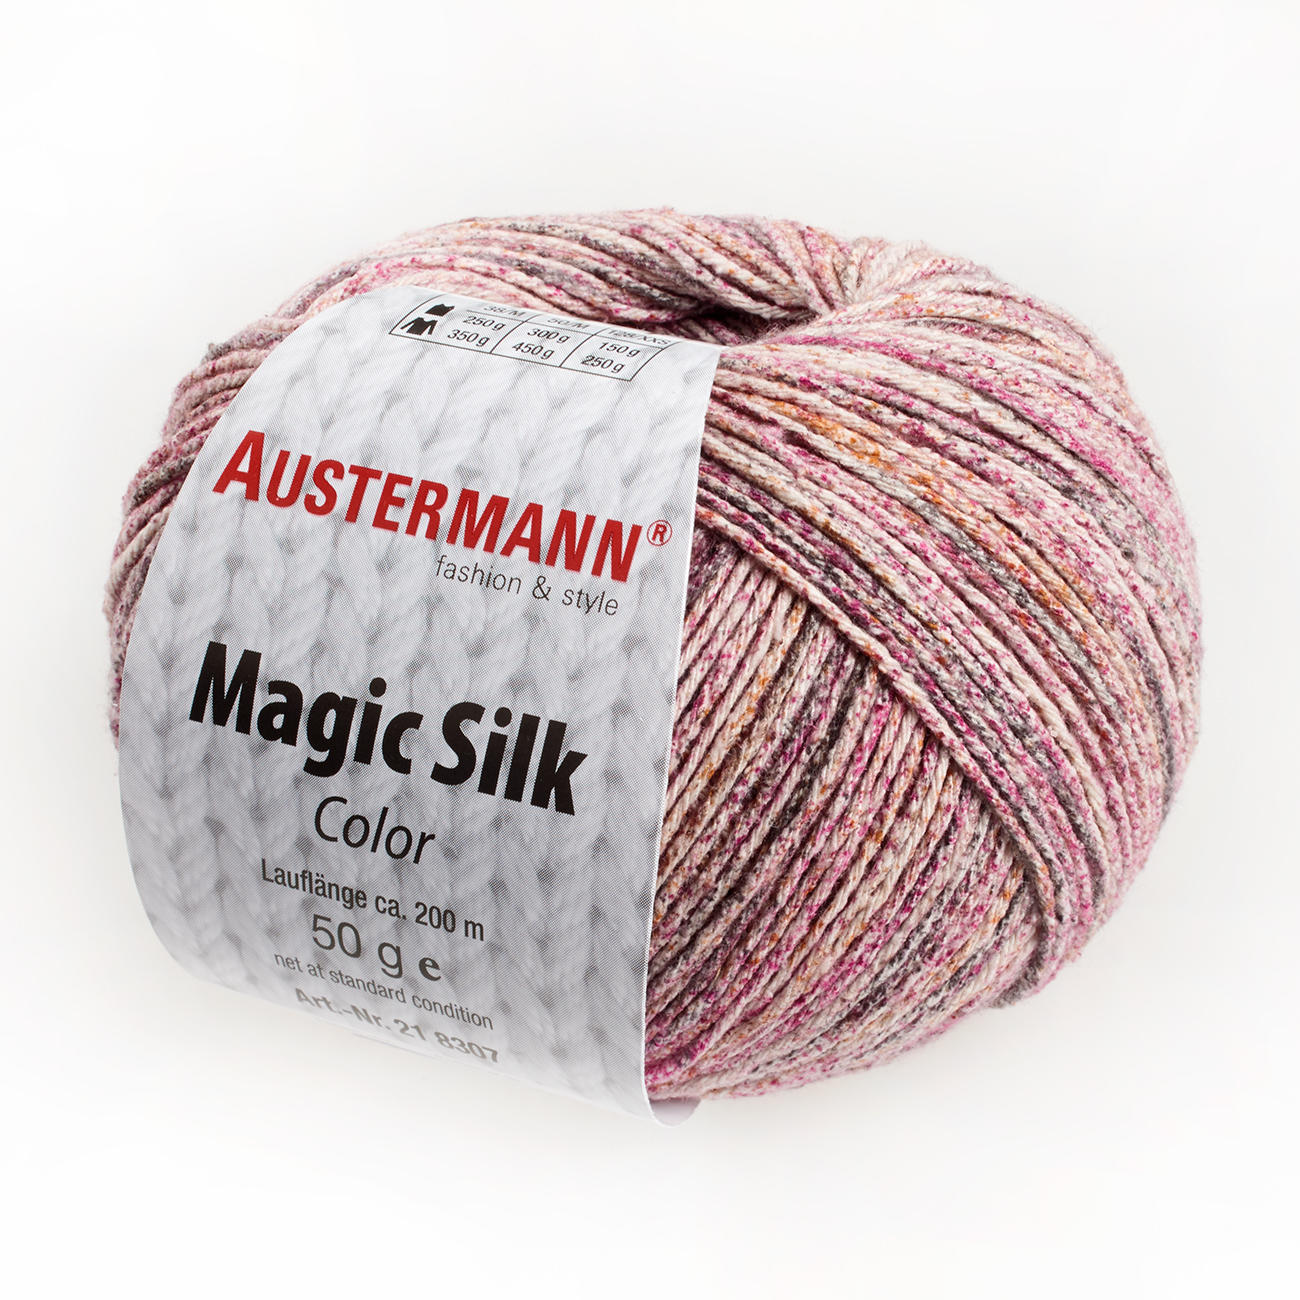 Anleitung 0968, Damen Jacke aus Magic Silk Color von Austermann®